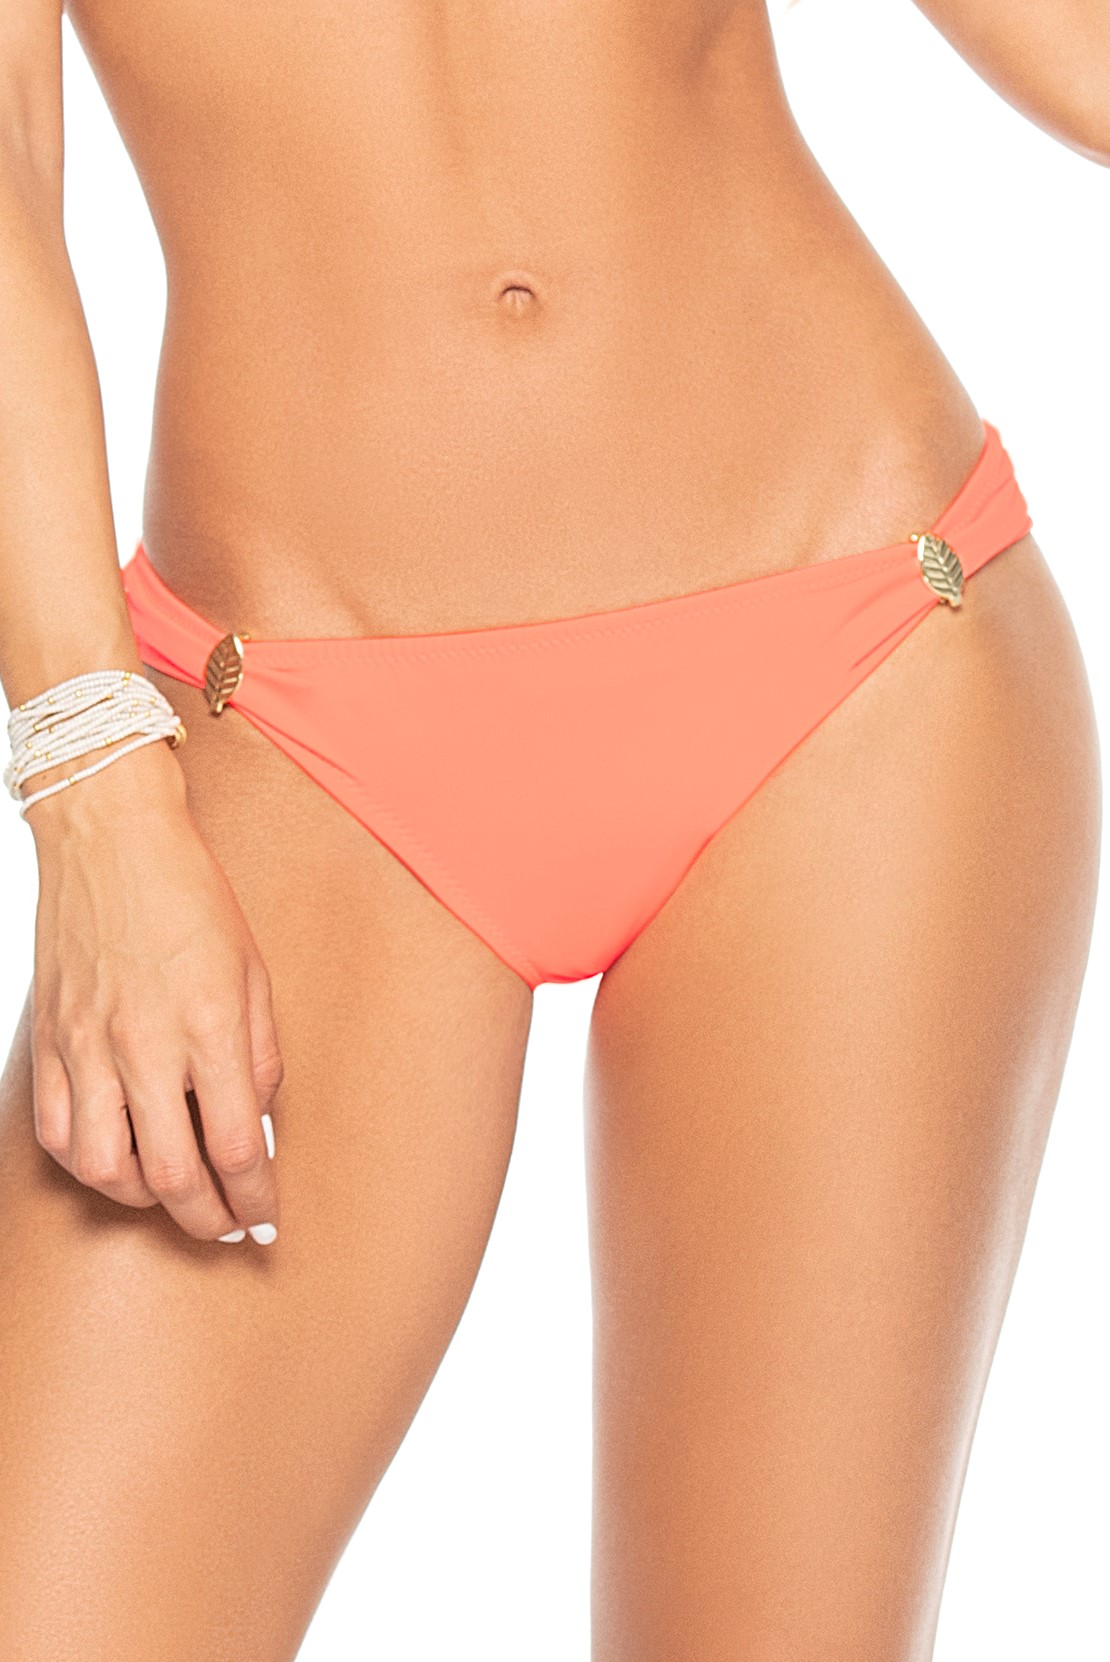 Phax Color Mix Pastel Orange Intermedium Bikini Bottom